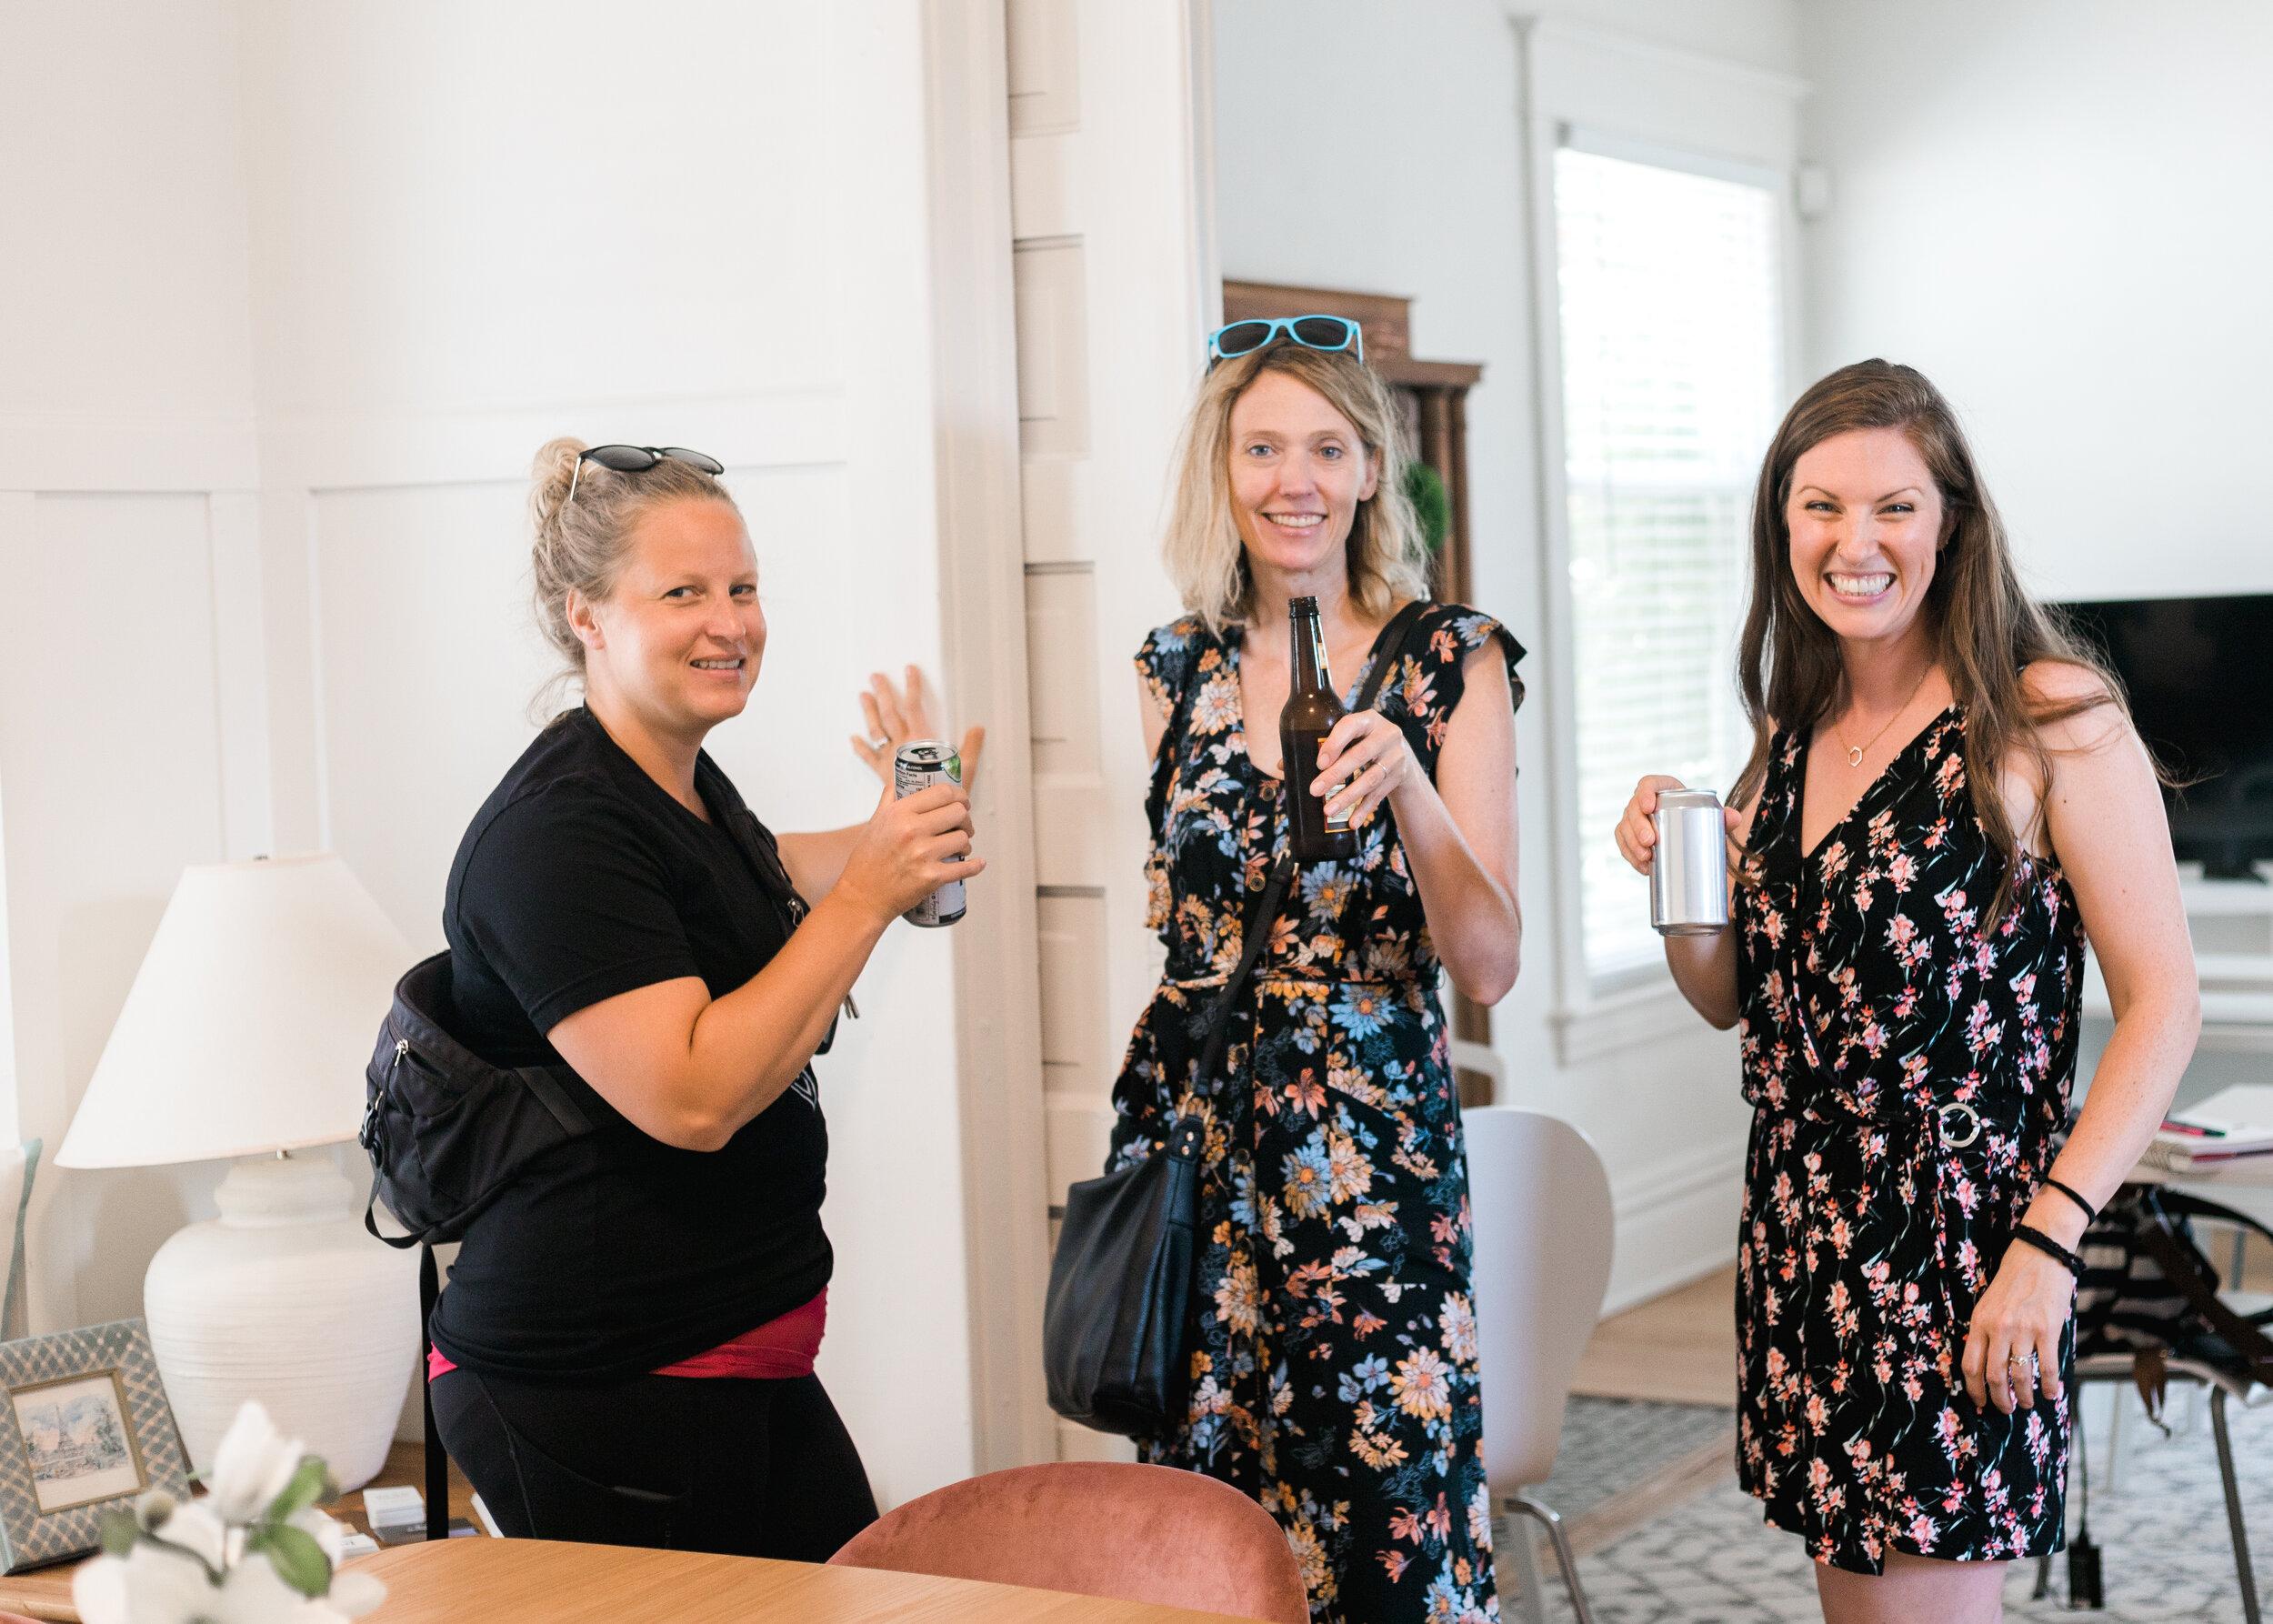 Women's networking and development